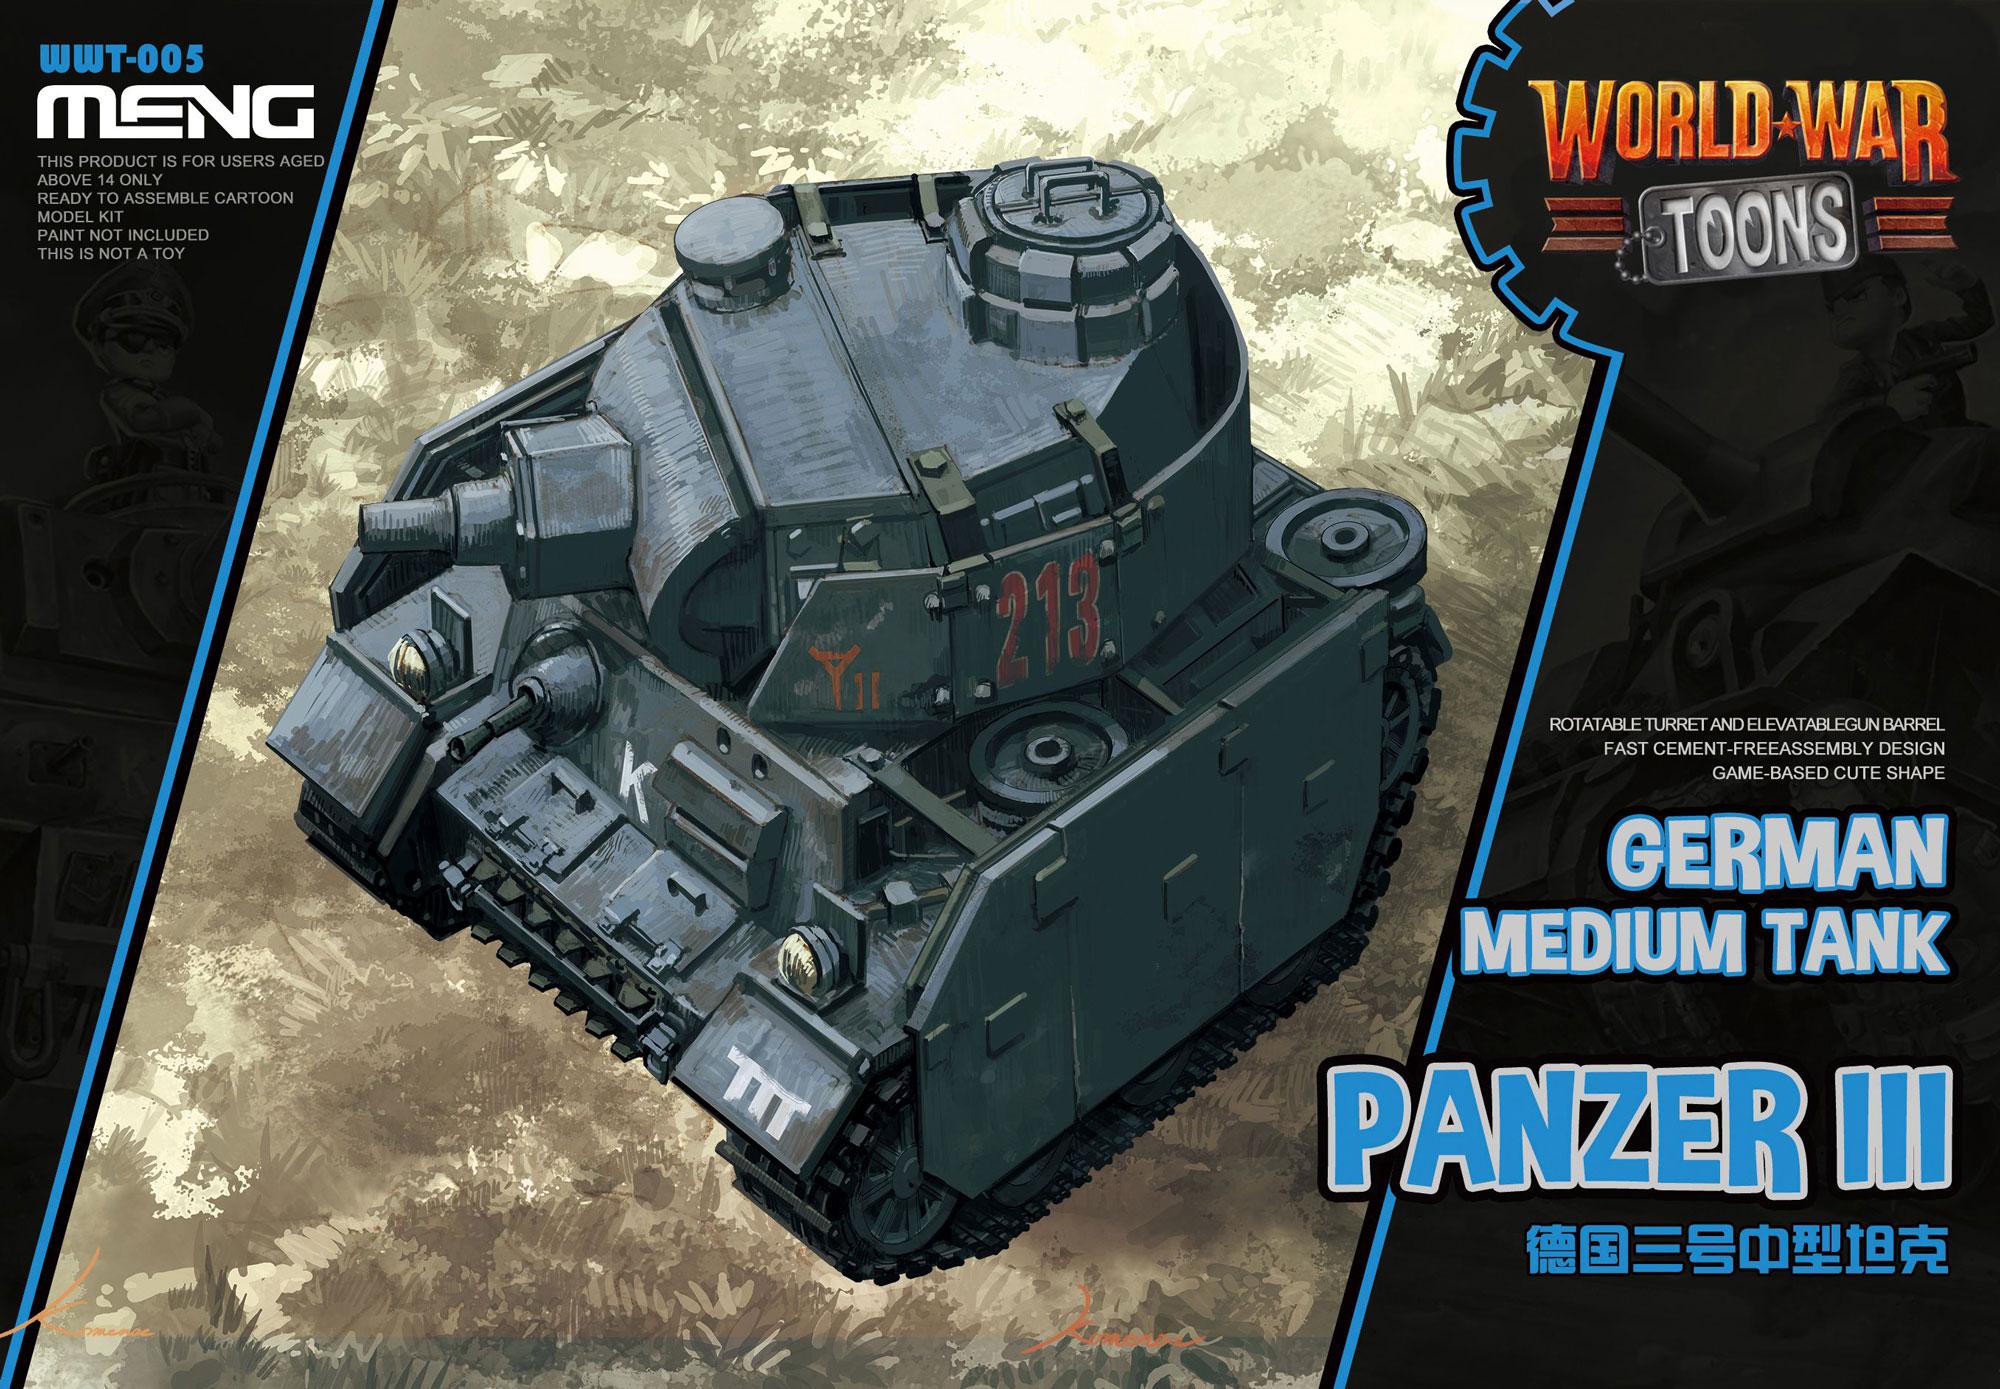 Meng German Medium Tank Panzer III